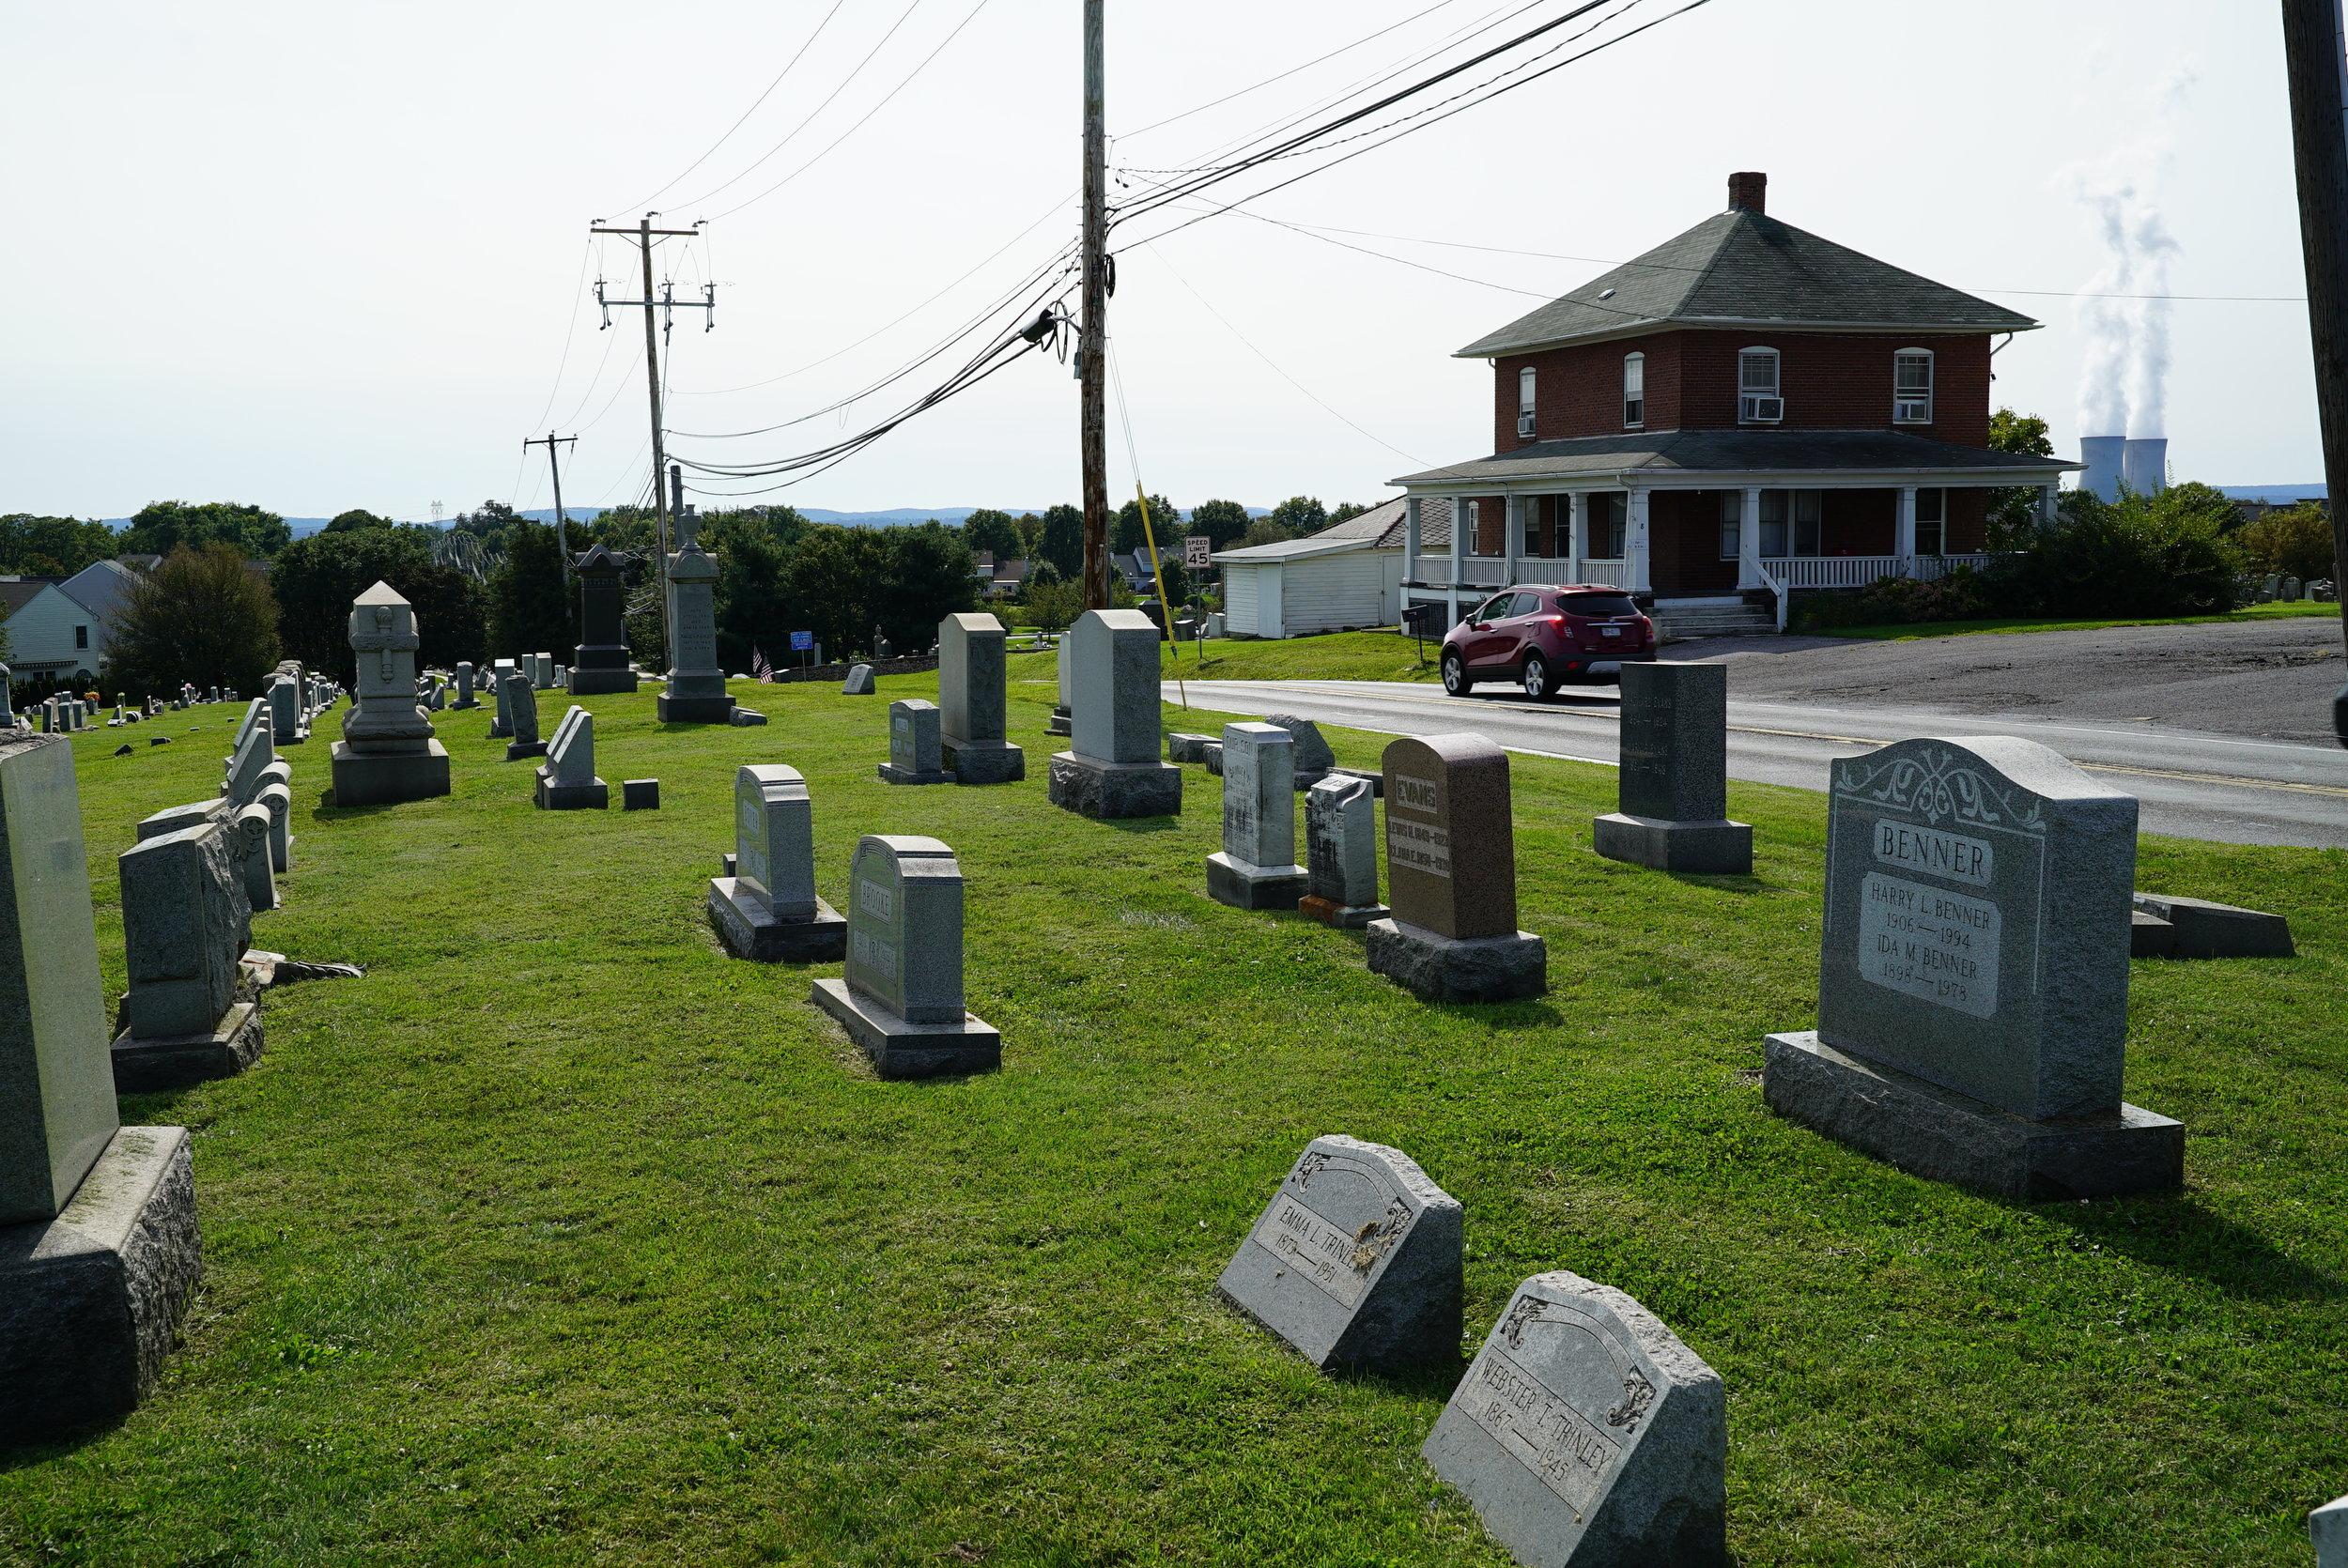 Limerick Church Burial Ground. Limerick, Pennsylvania.